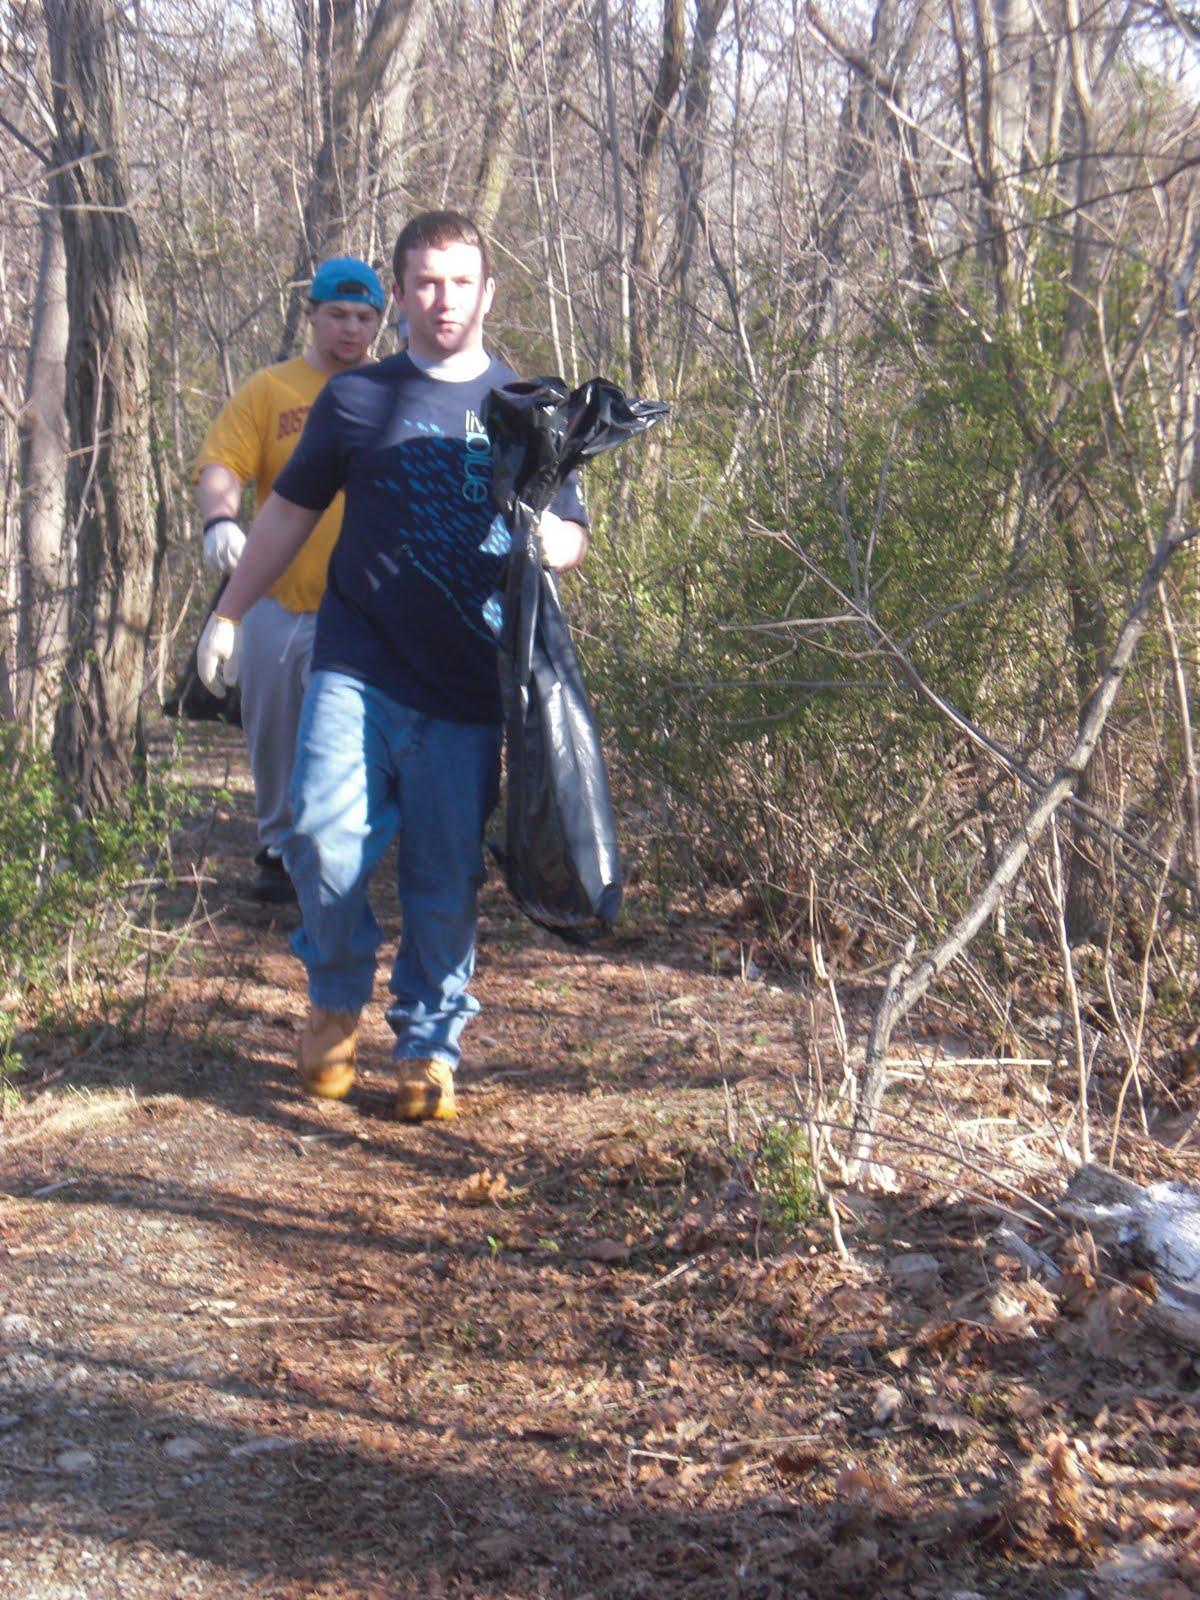 Brian w picking up trash